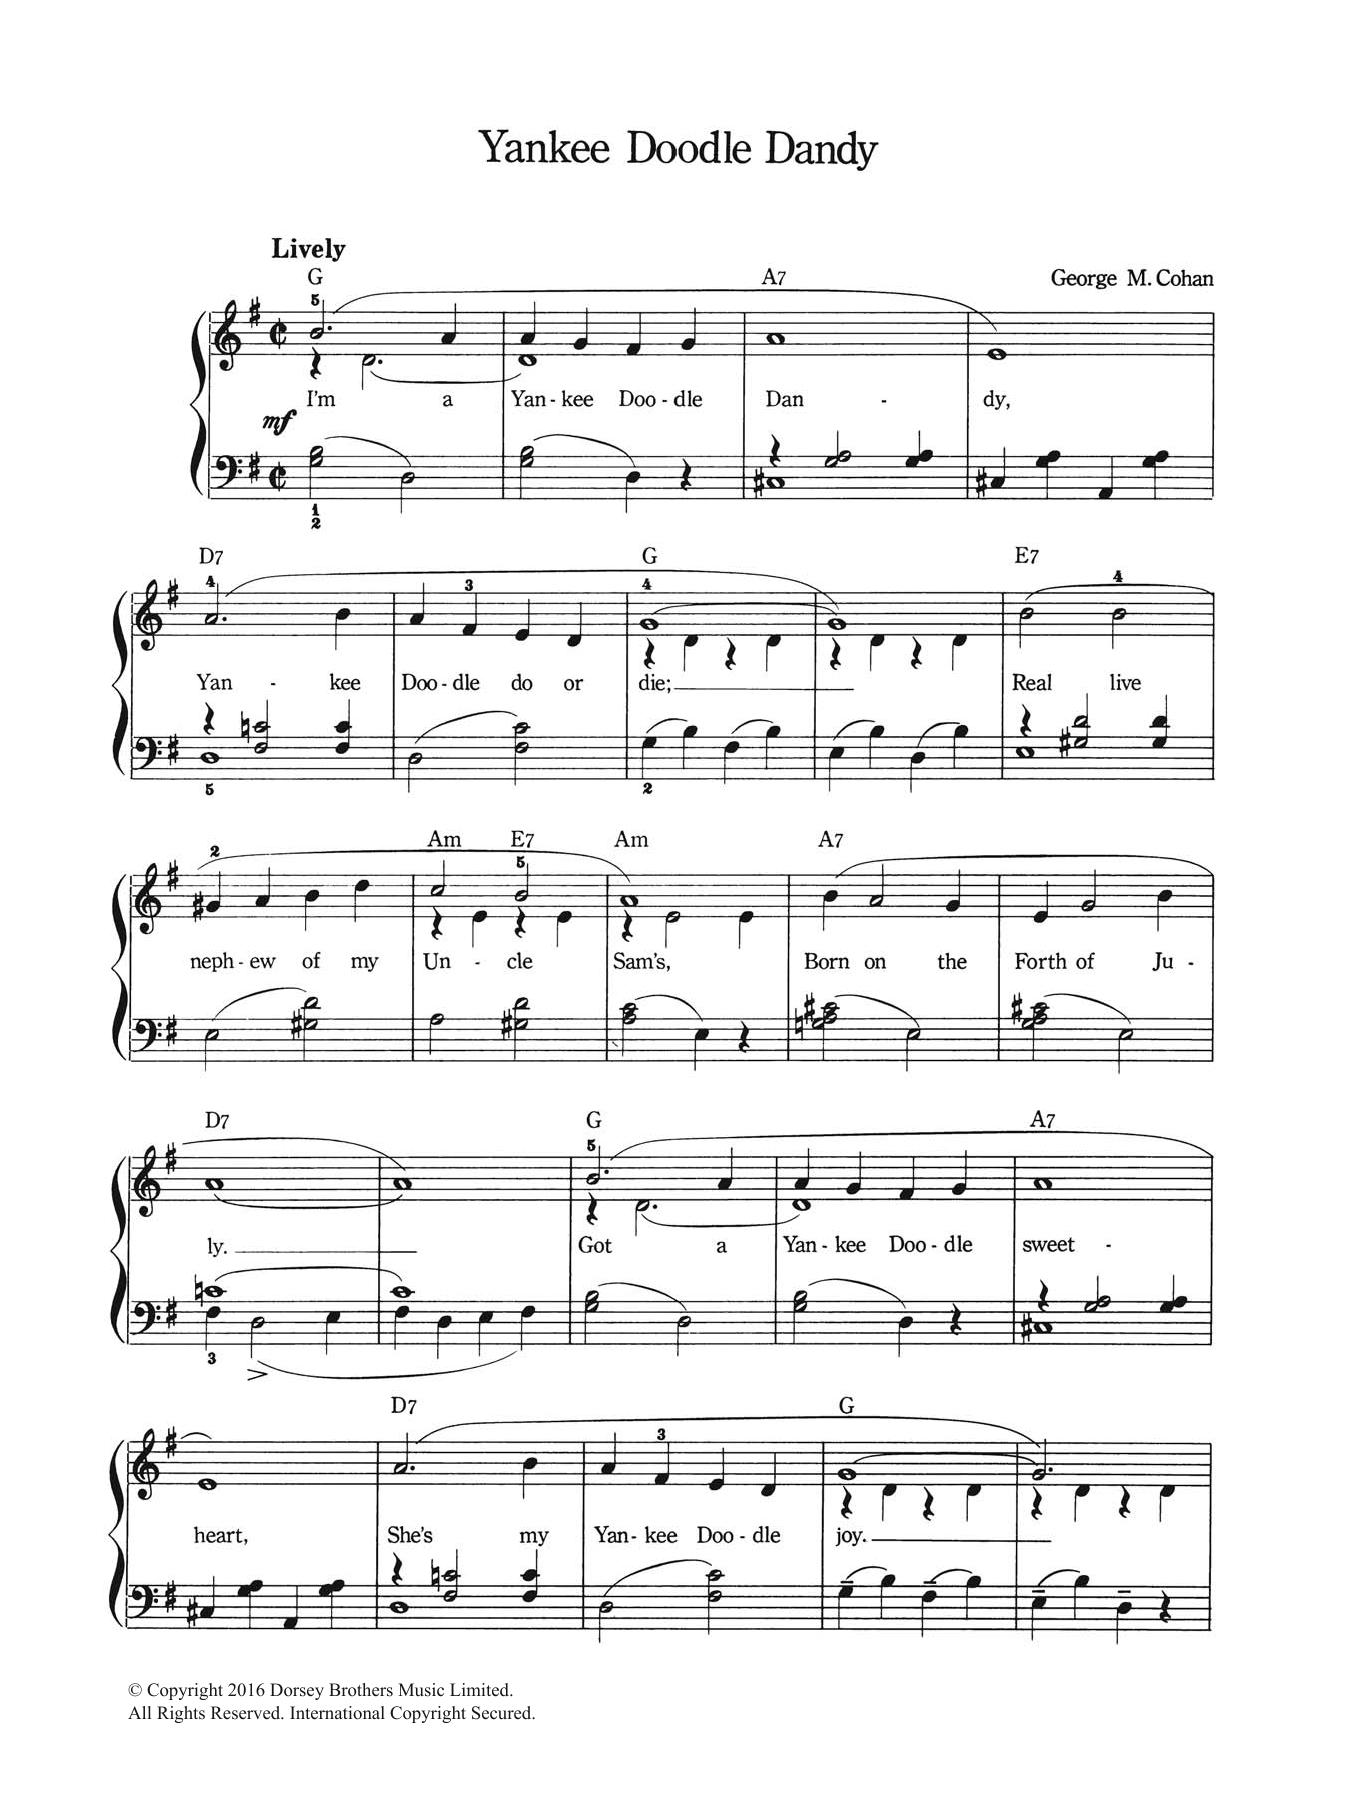 Yankee Doodle Dandy Sheet Music